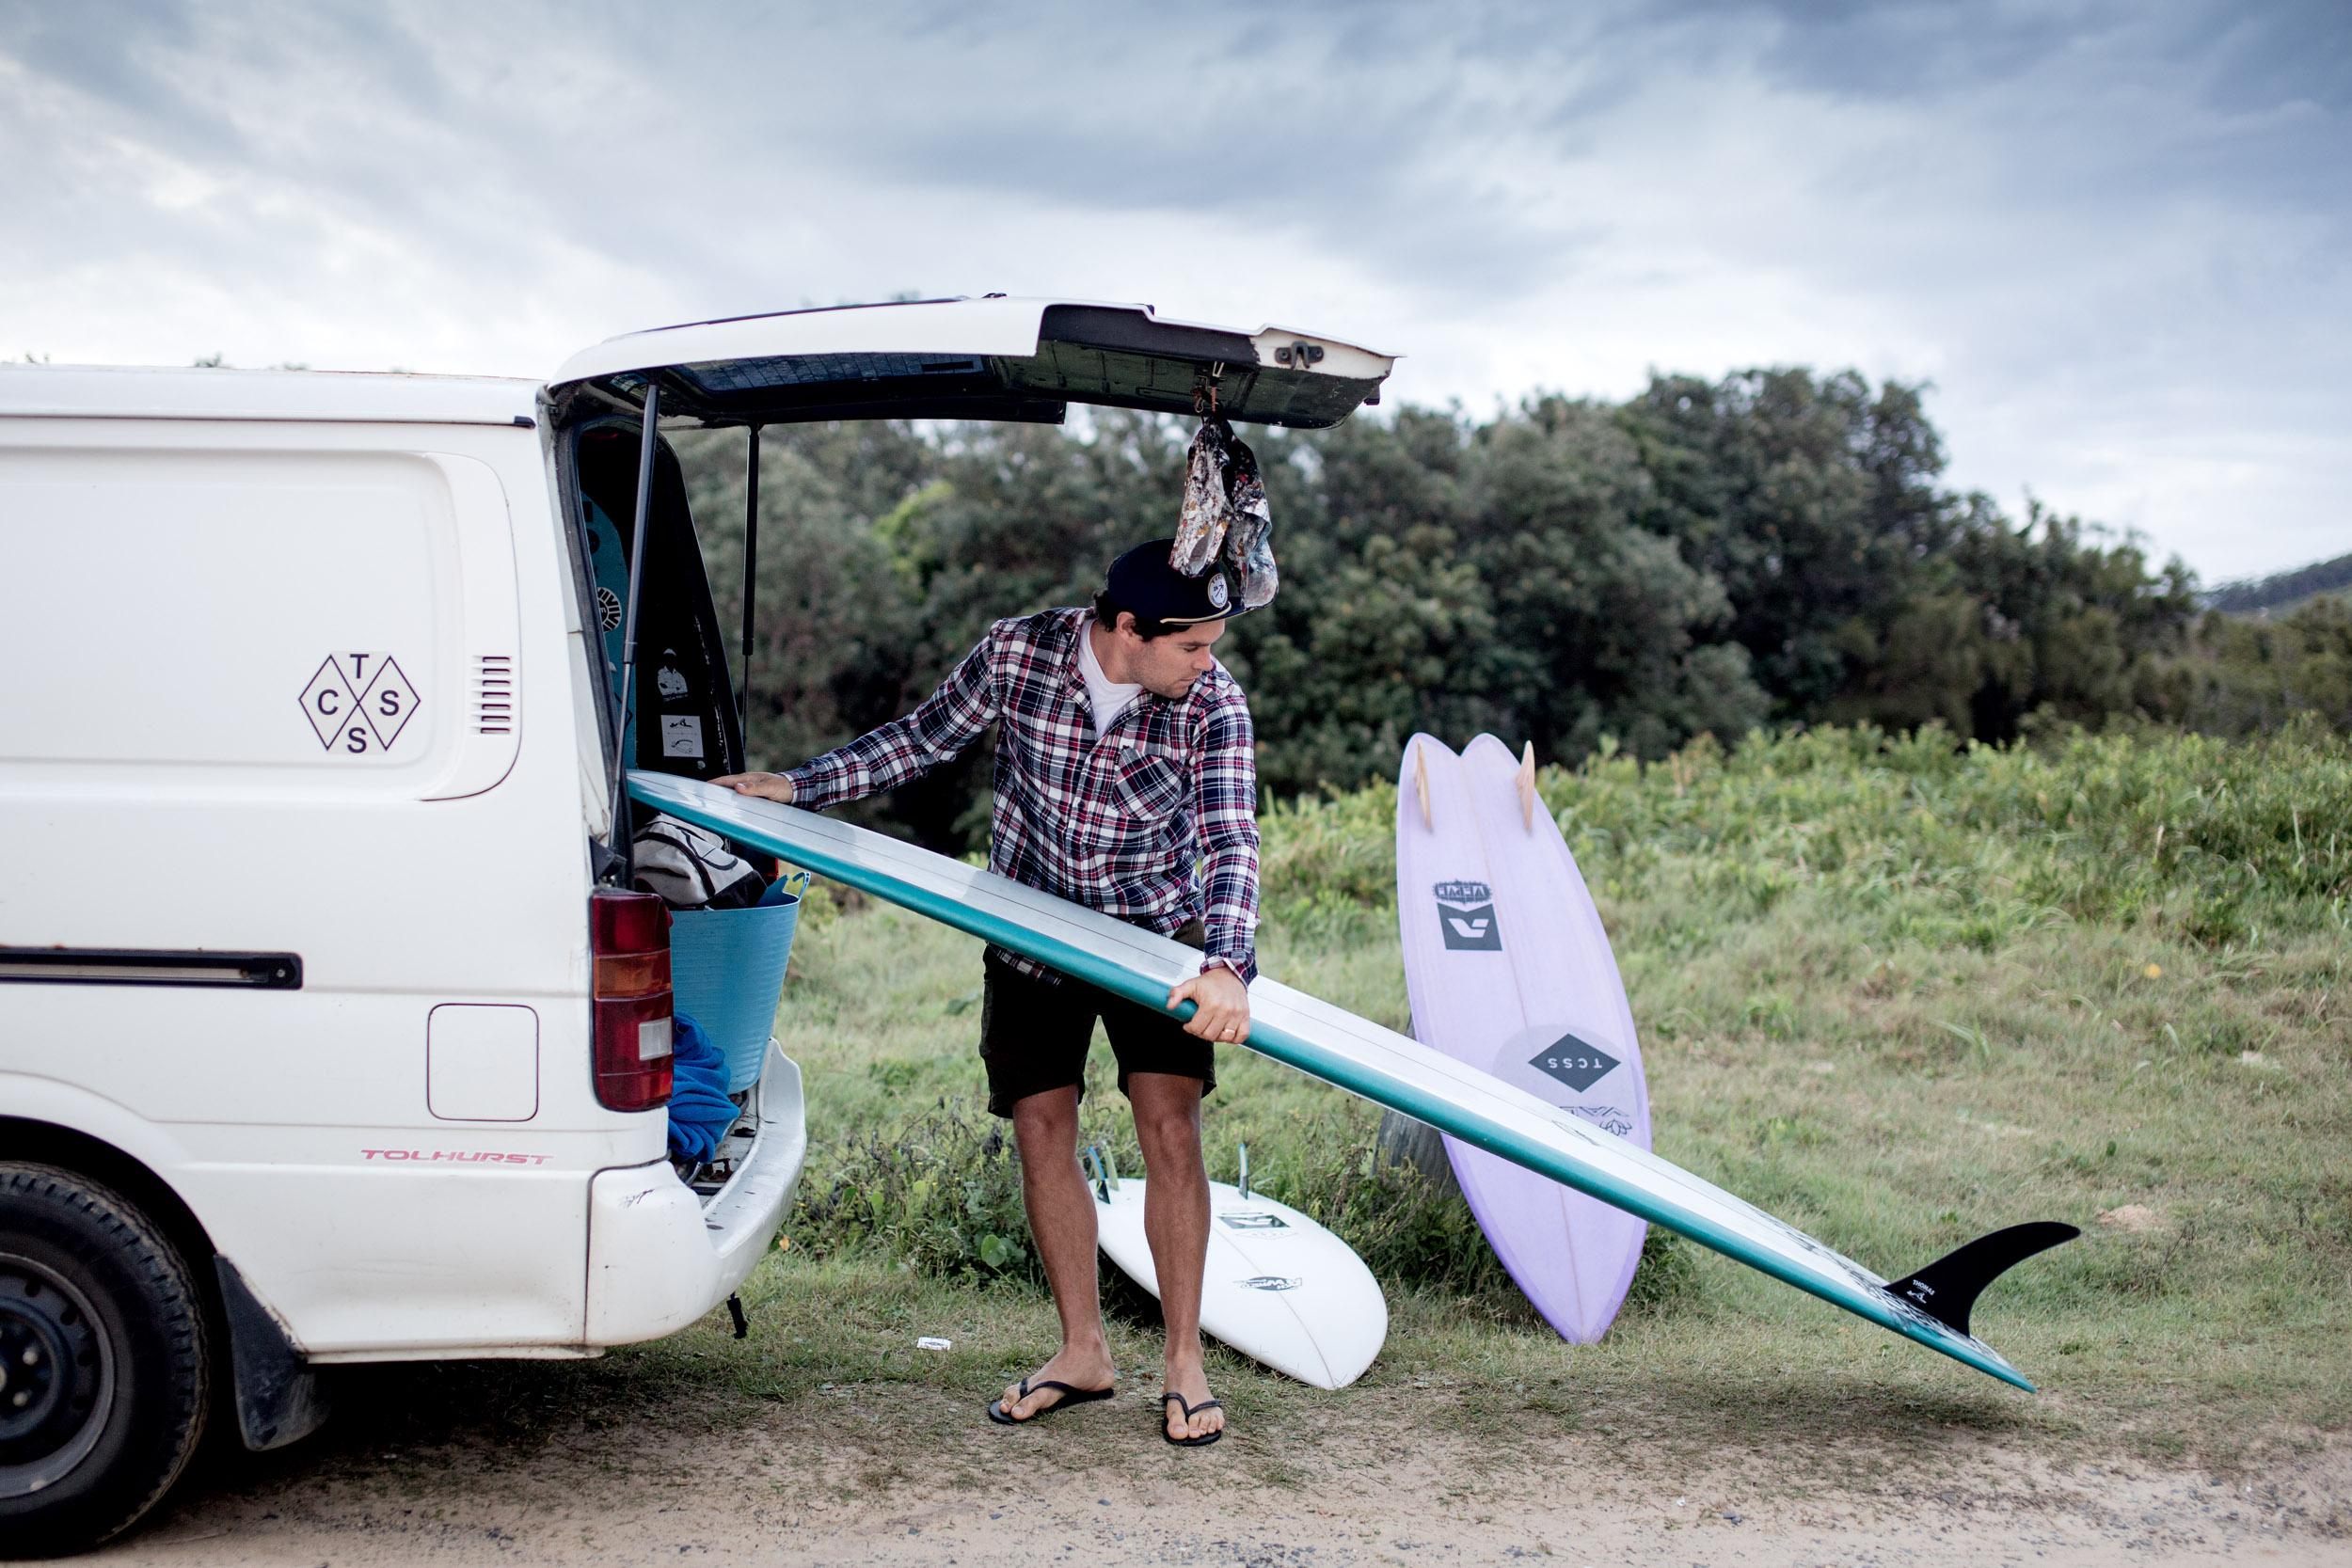 surf-lifestyle-alternative-craft-S1661-101.jpg